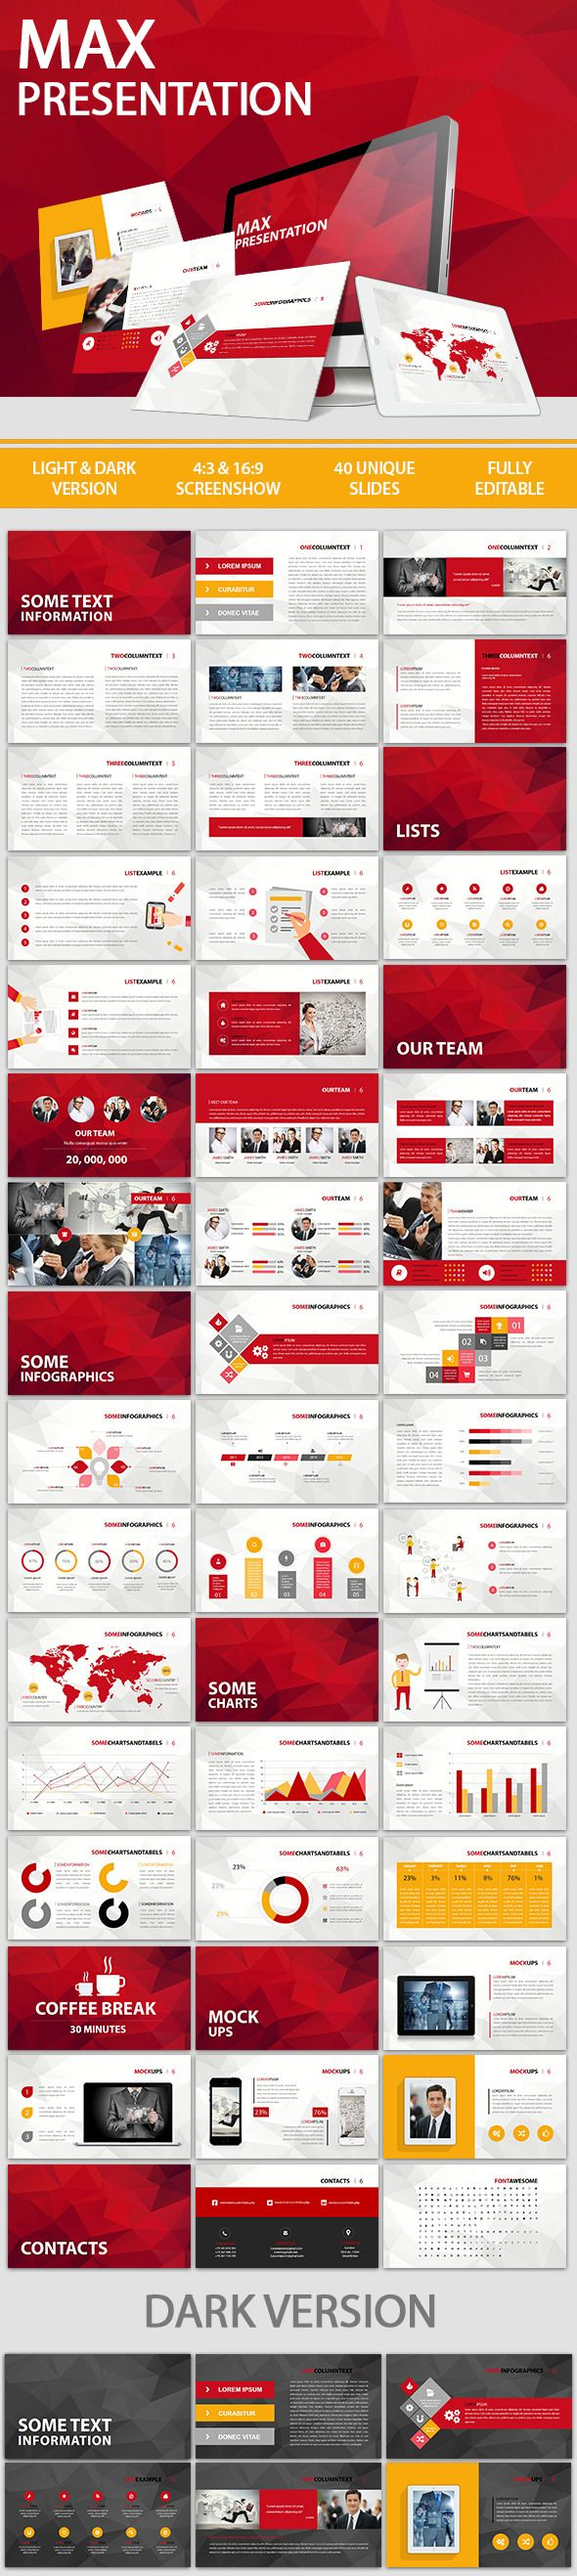 Max Presentation (PowerPoint Templates)